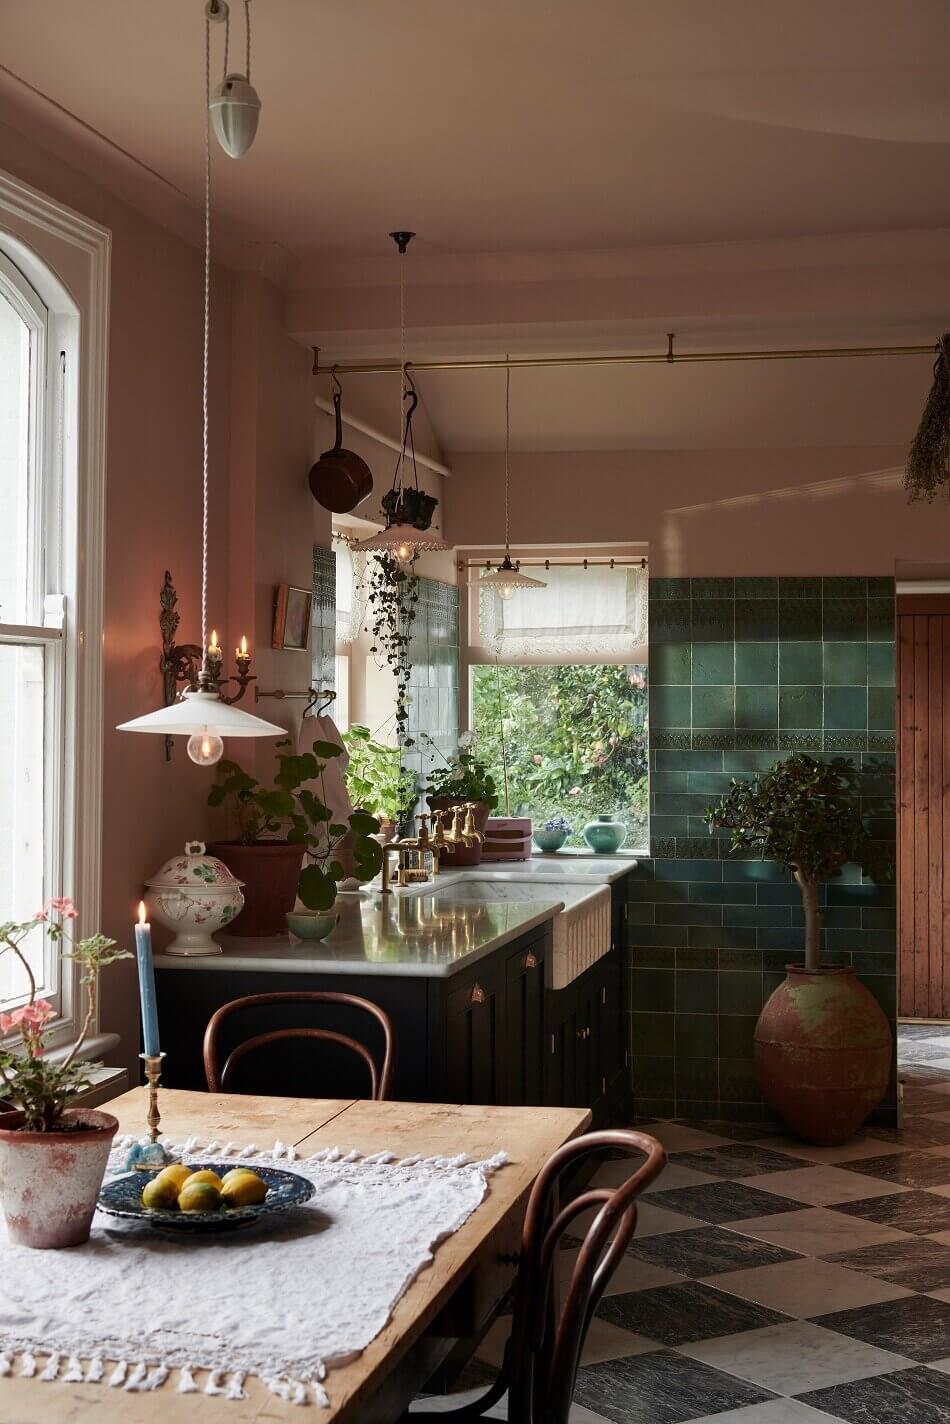 A Classic deVOL Kitchen with Mediterranean Color Scheme